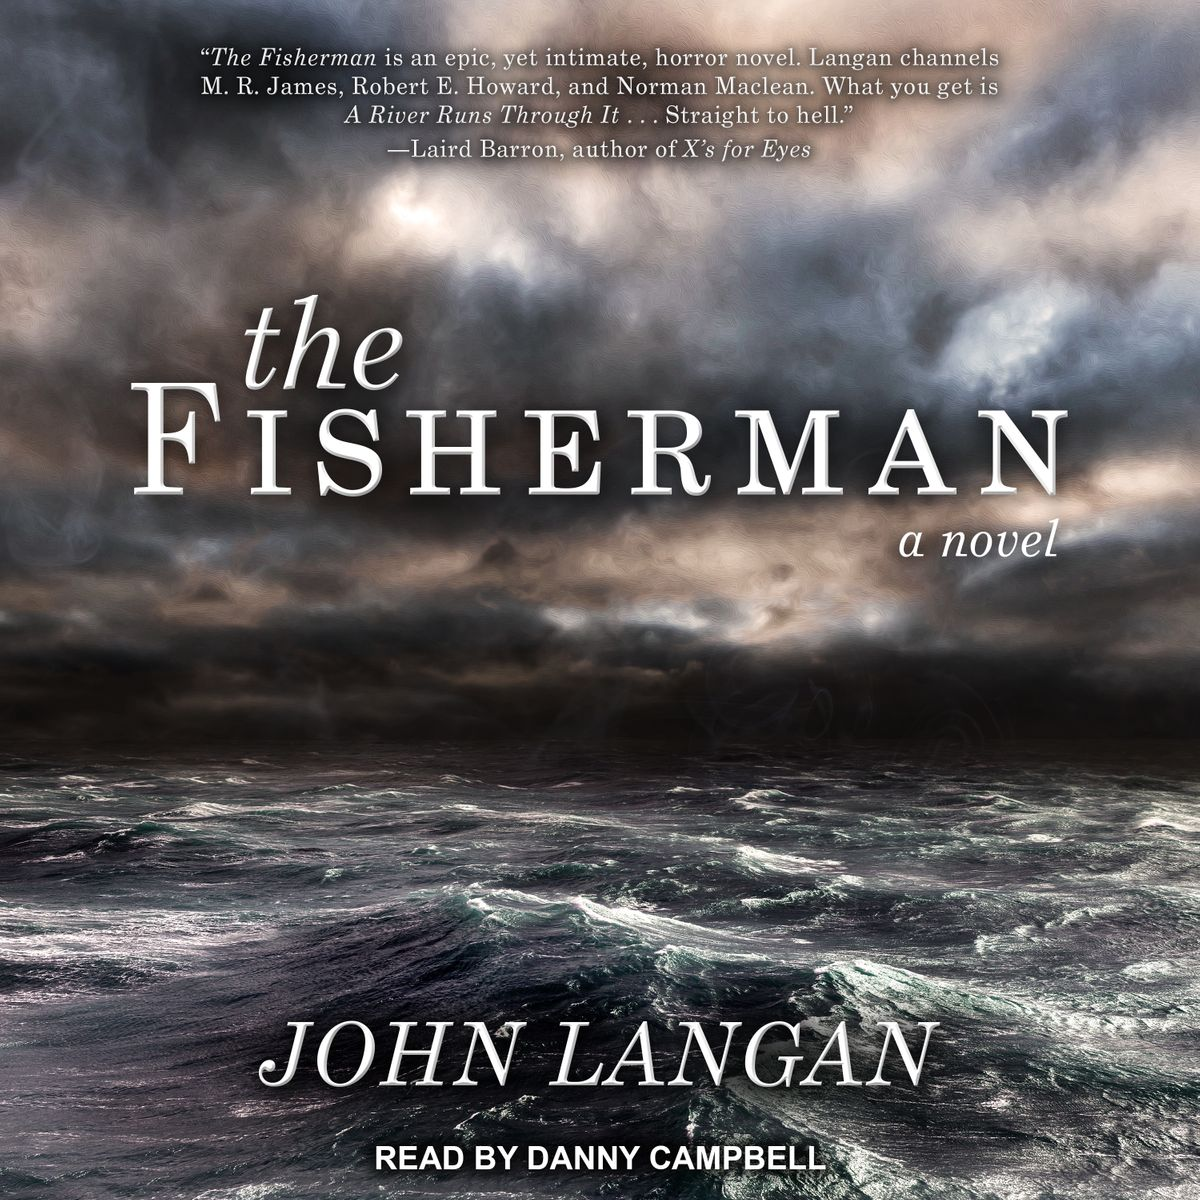 The New Fairy Tale Called The Fisherman | Gwendolyn N  Nix